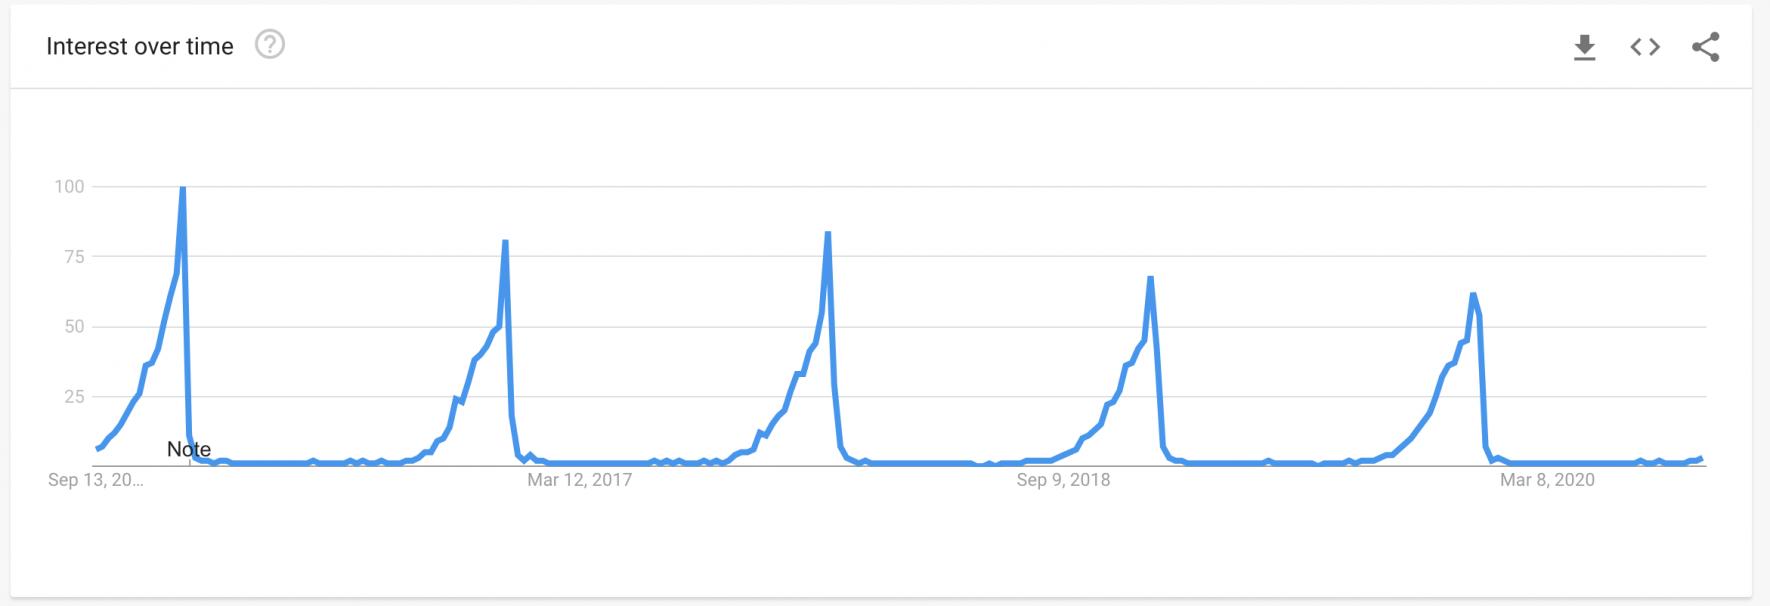 Christmas cake recipe: interest over time